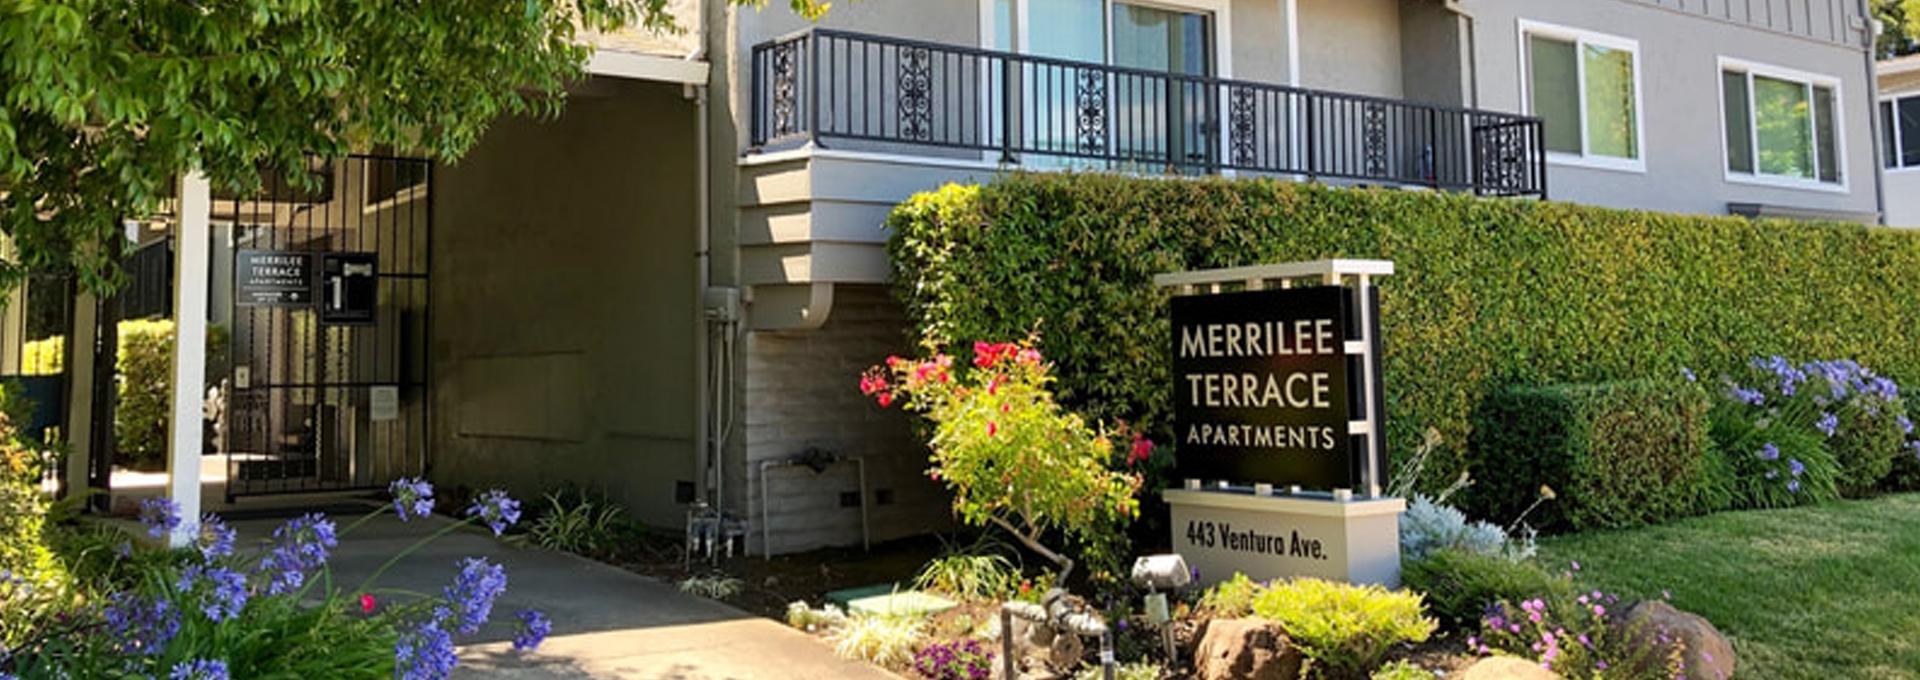 Merrilee Terrace Apartments